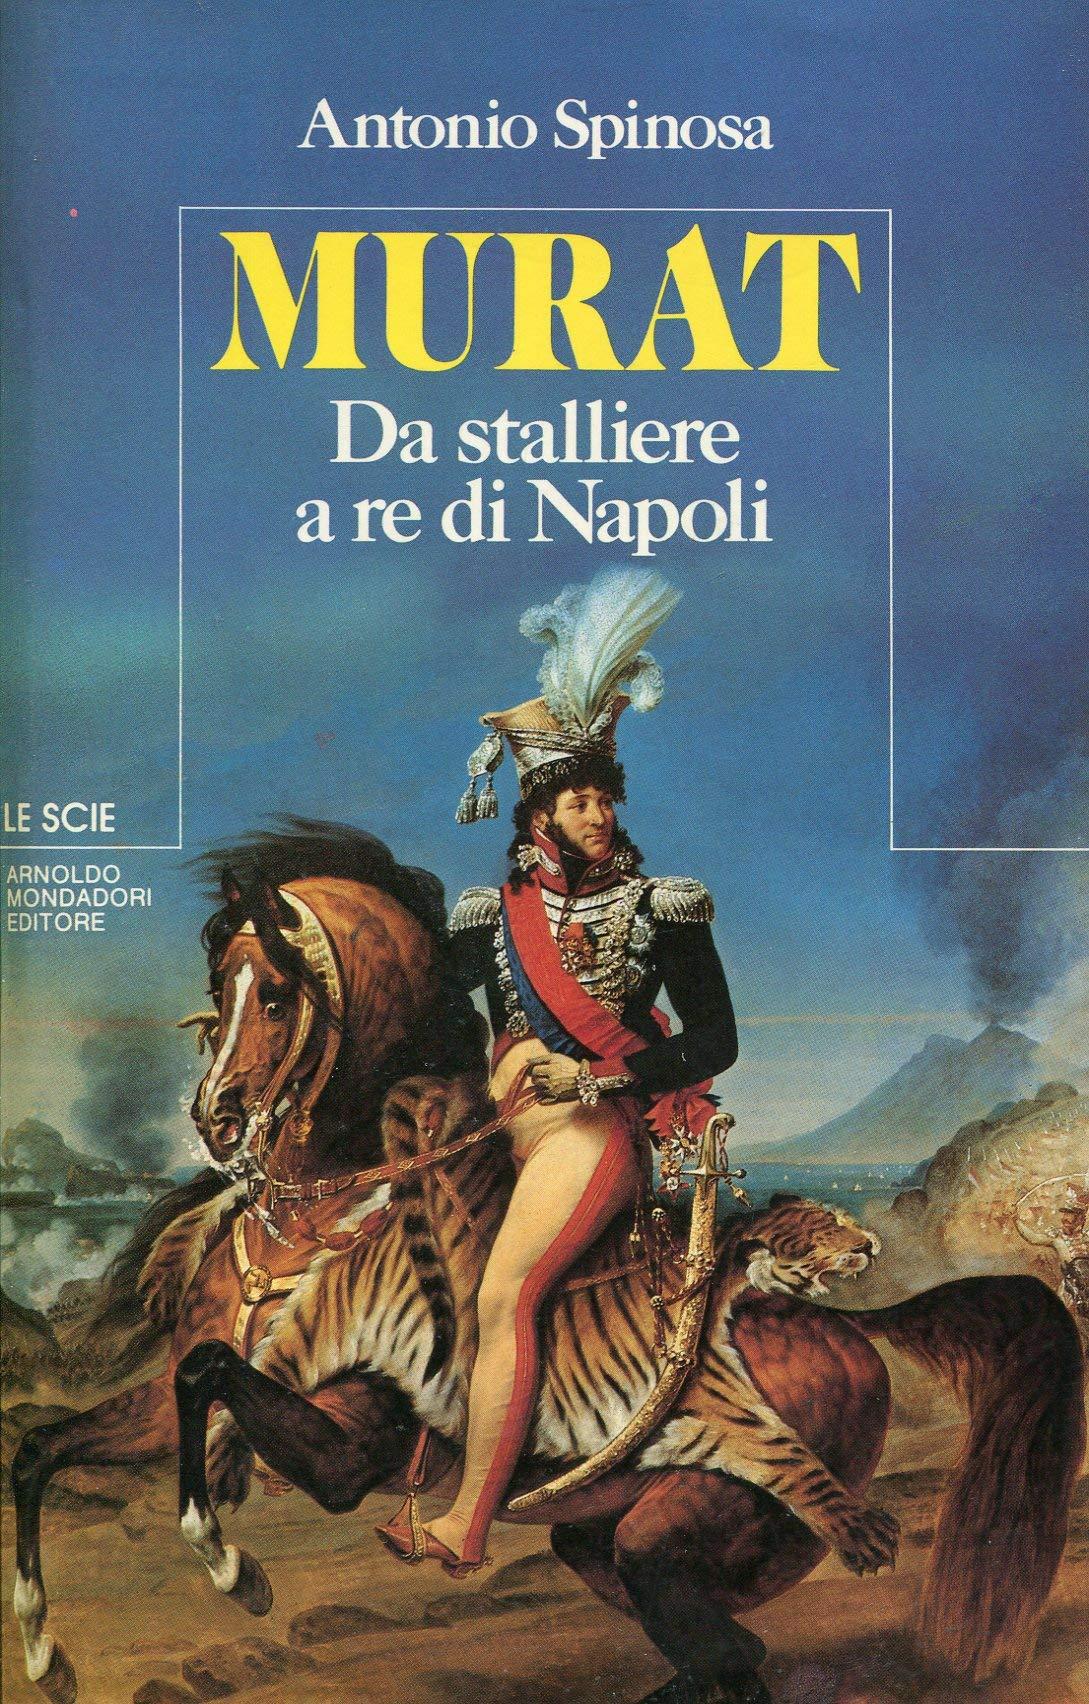 Napoleone. Il flagello d'Italia. Le invasioni, i saccheggi, gli inganni